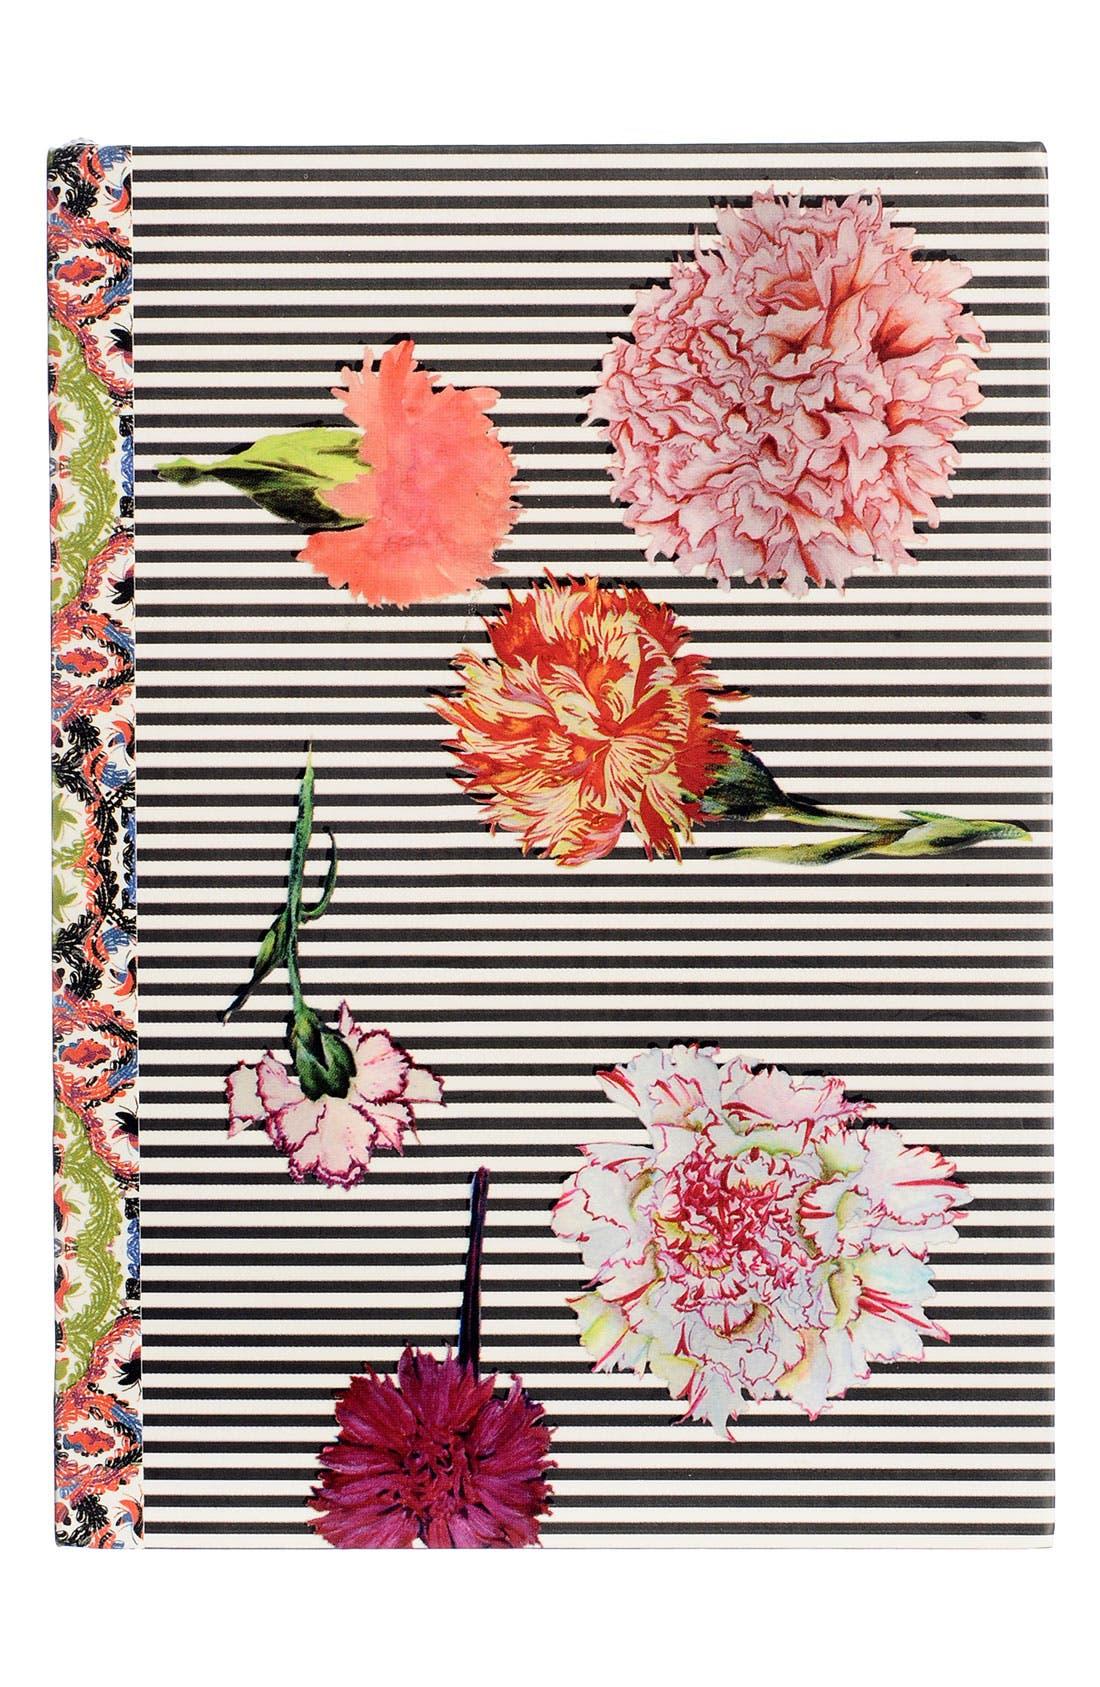 Main Image - Christian Lacroix 'Feria' Notebook